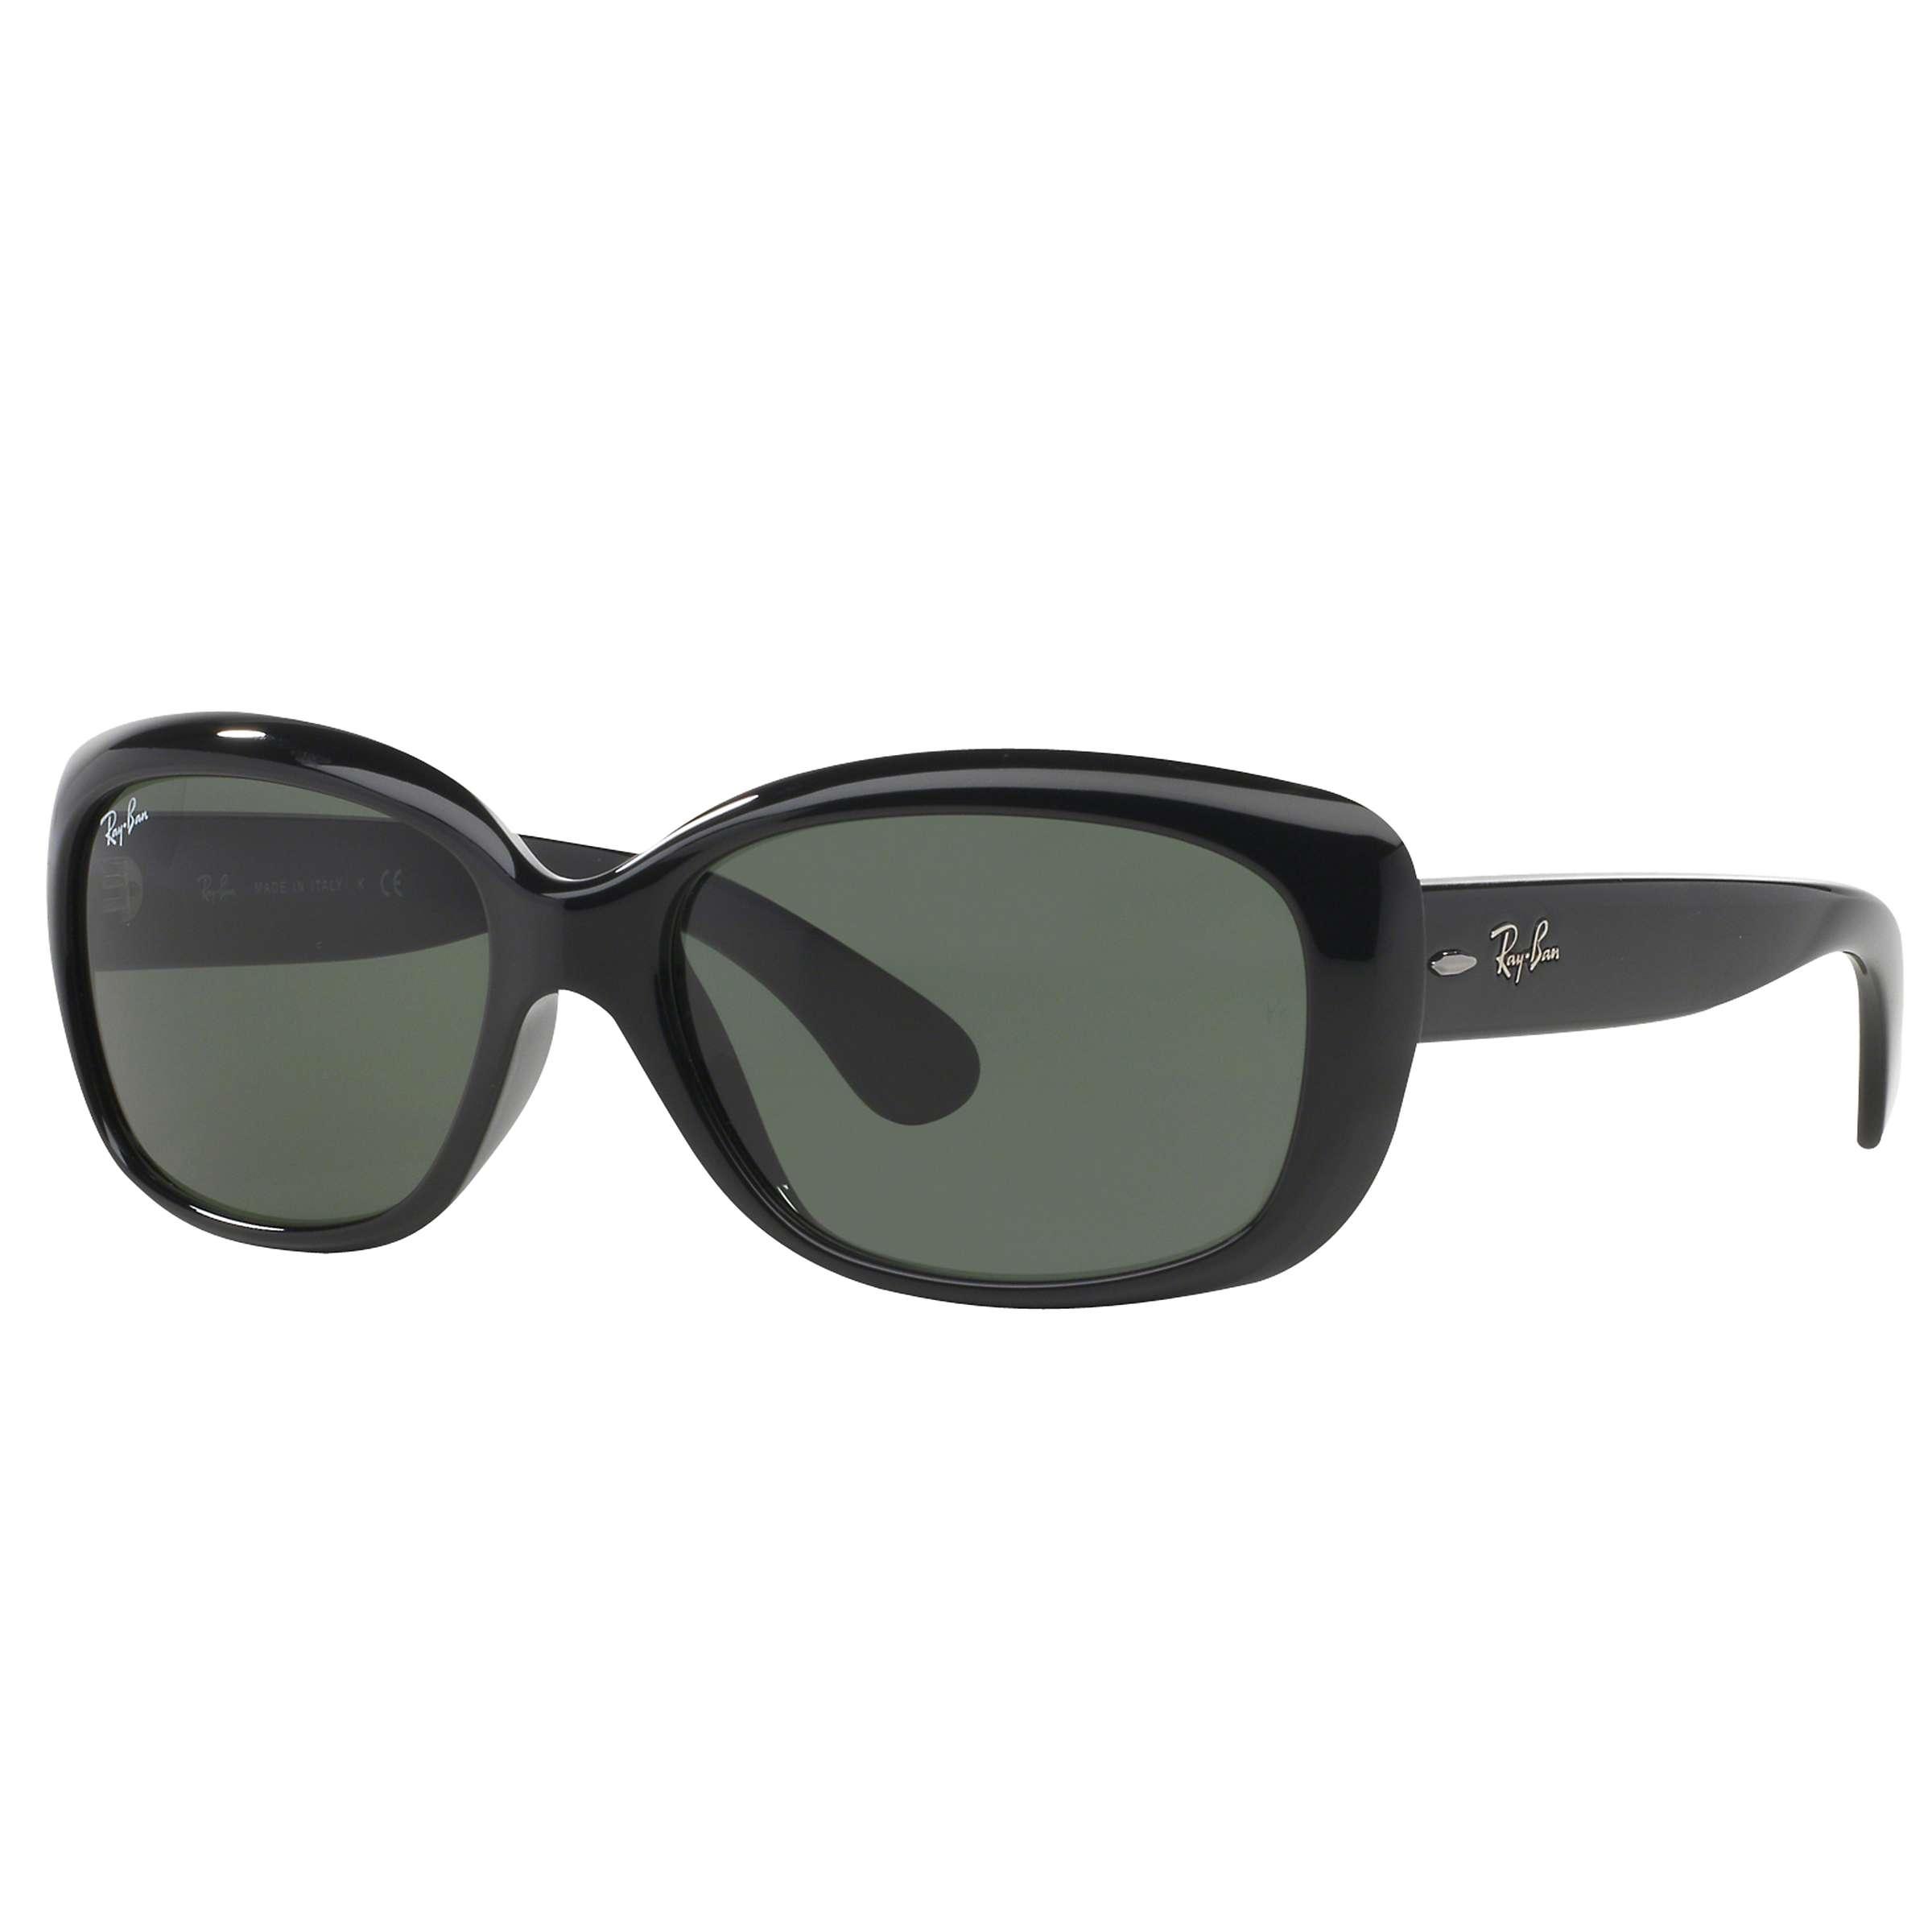 Ray Ban RB20 Women's Jackie Ohh Rectangular Sunglasses, Black/Green